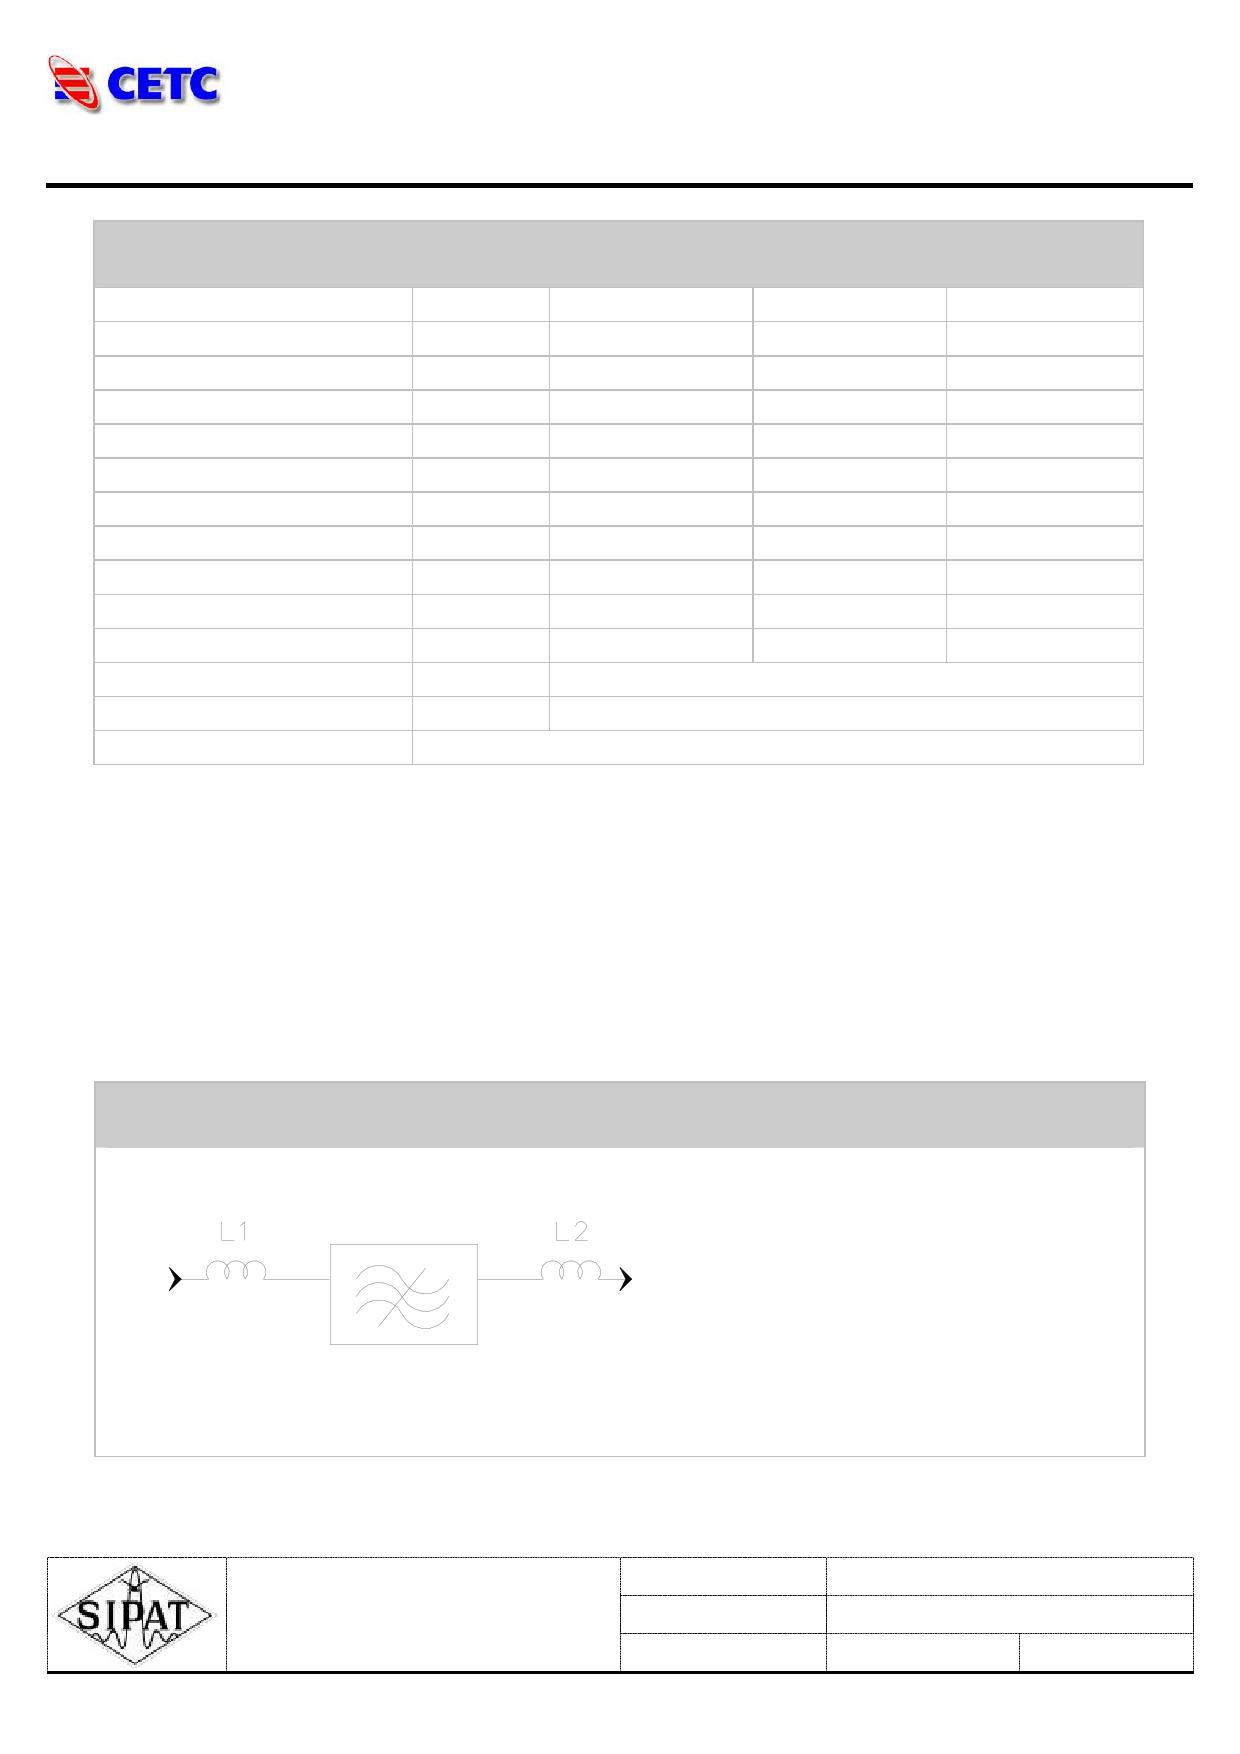 LBN70A20 datasheet